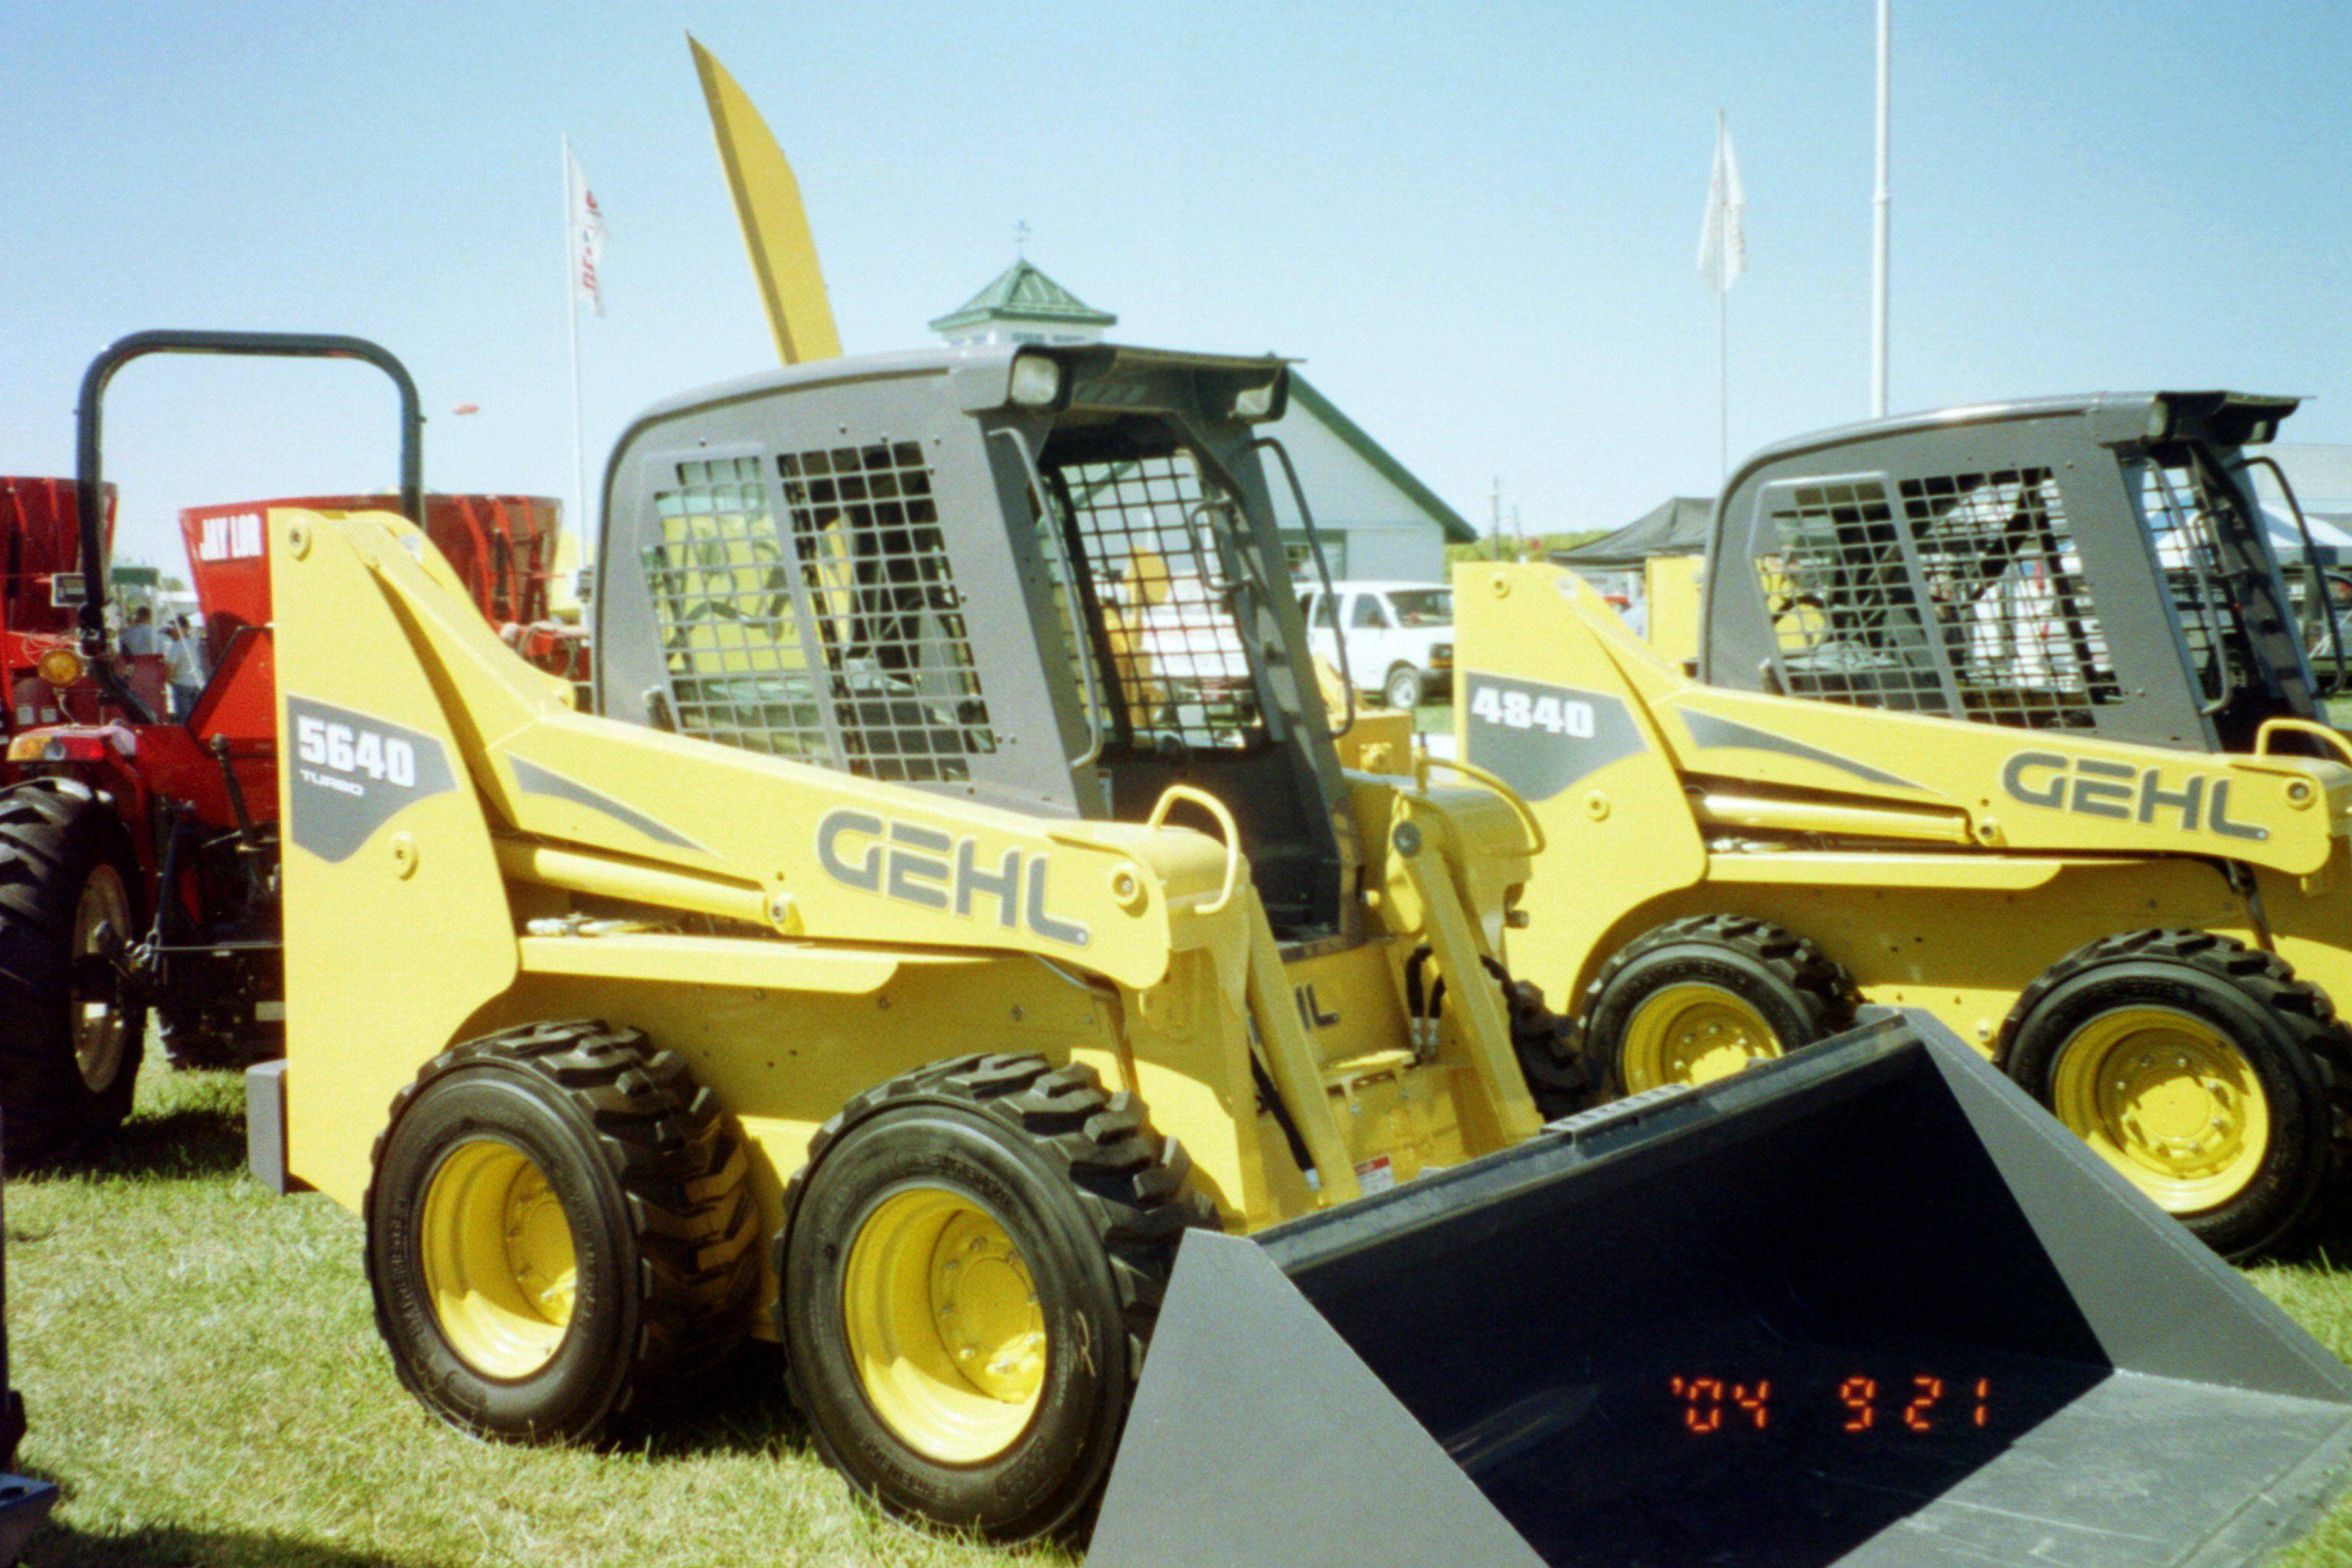 Gehl 5540 skid steer loader